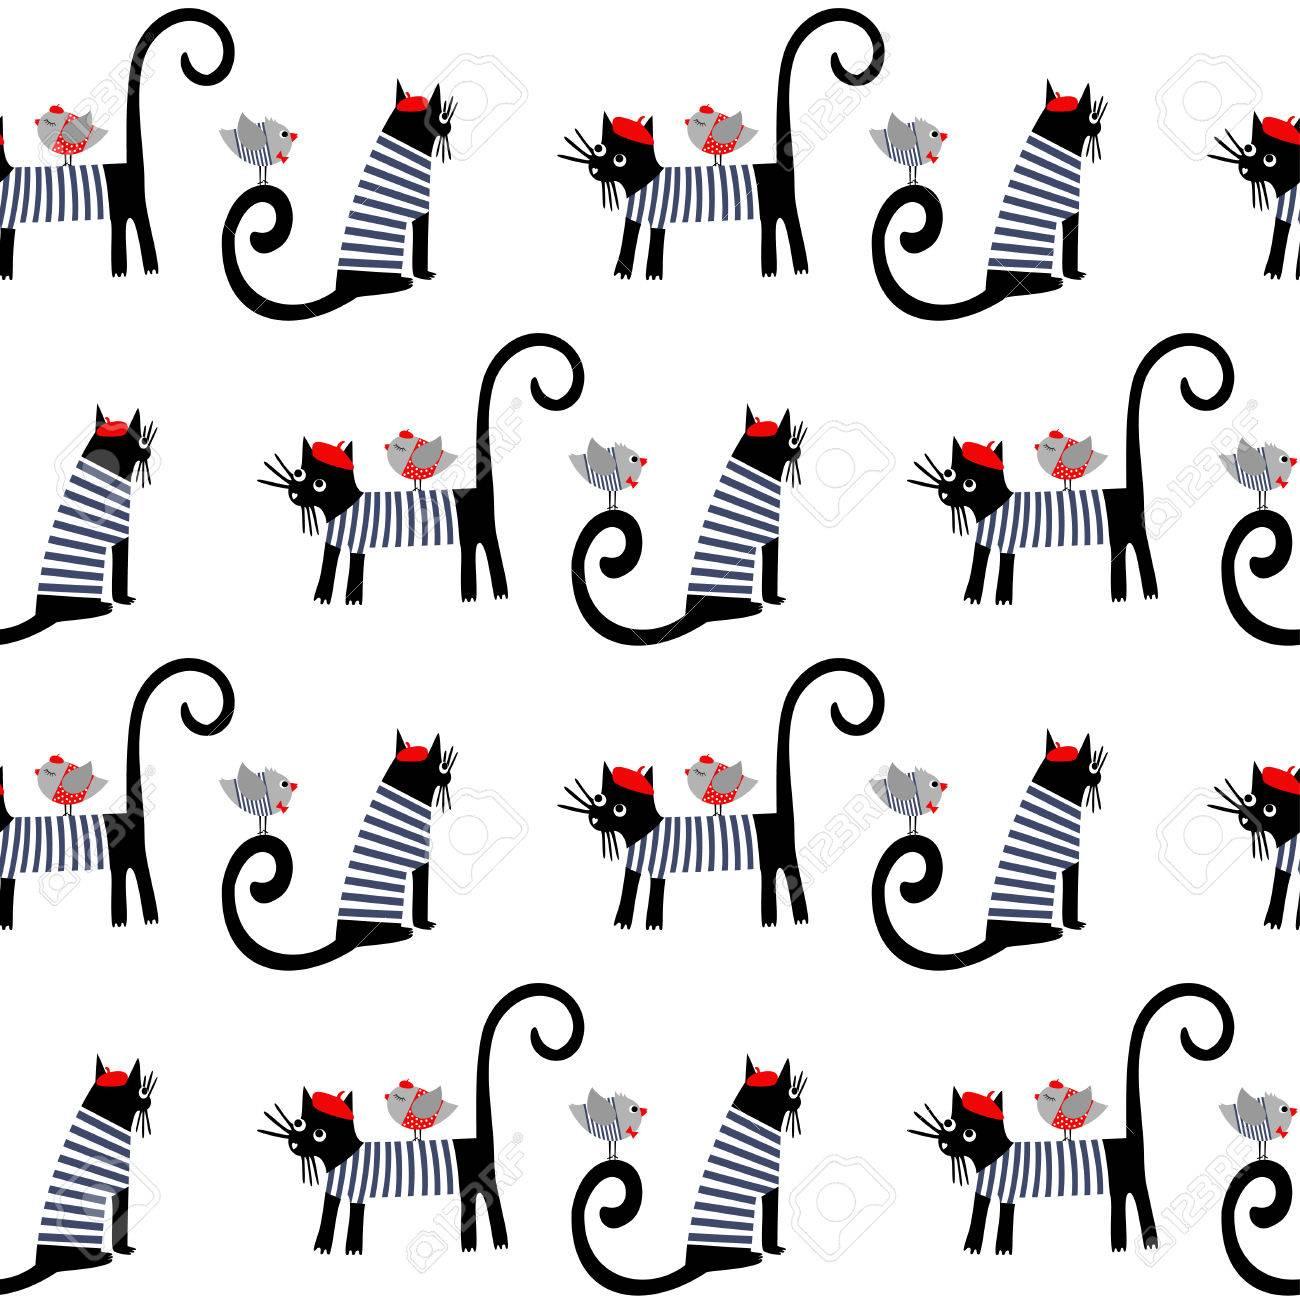 Animales Vestidos De Estilo Francés Inconsútiles Del Modelo. Gatos ...